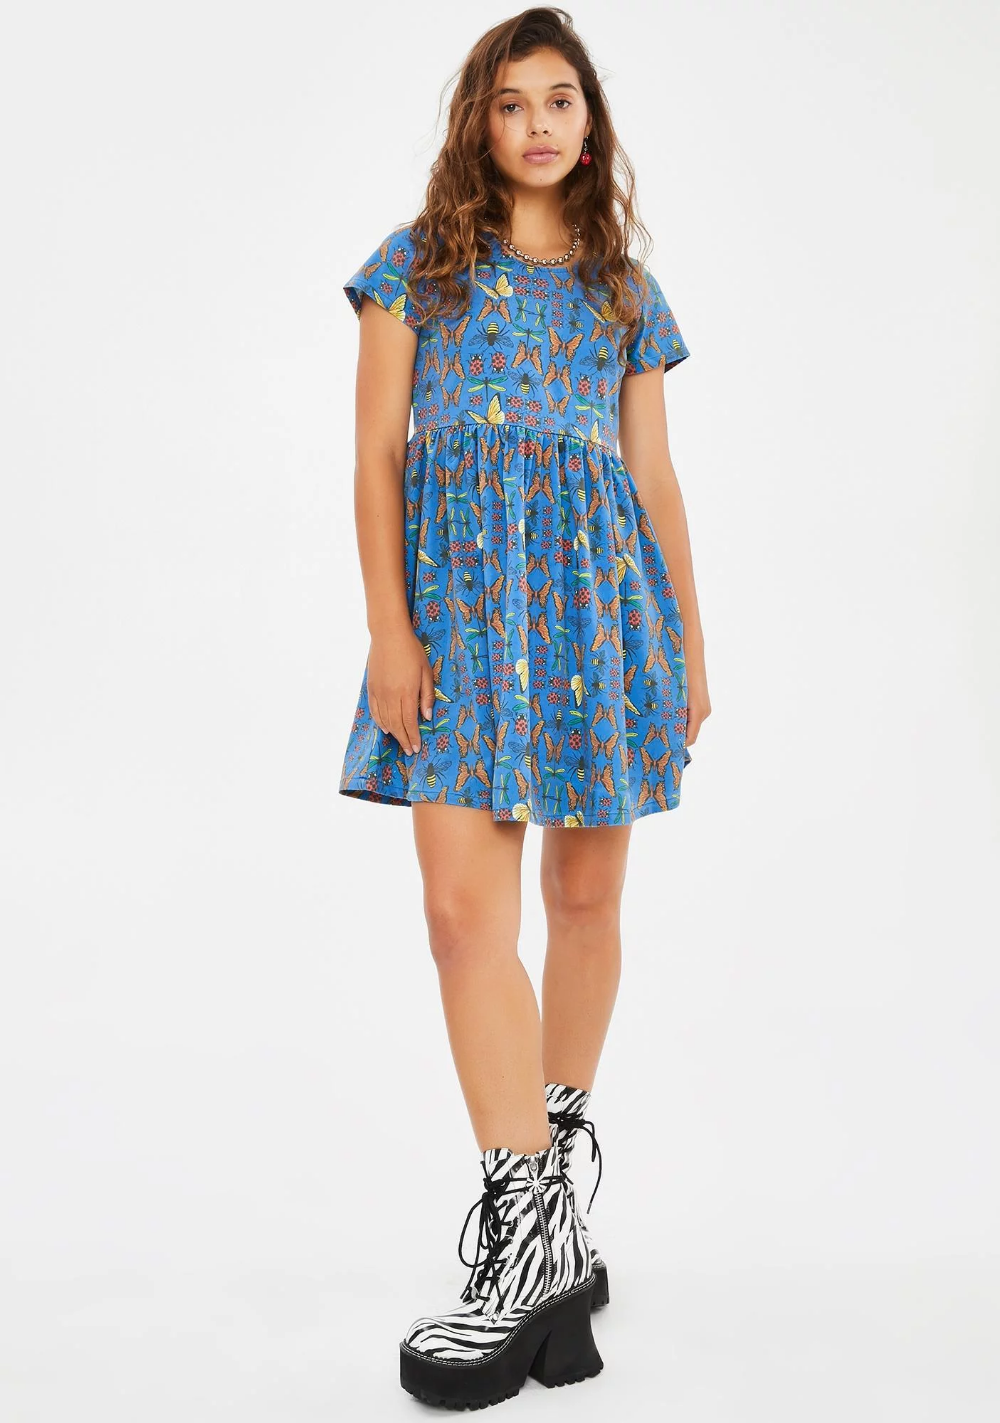 Buzz Off Babydoll Dress Dresses Babydoll Dress Constellation Dress [ 1423 x 1000 Pixel ]